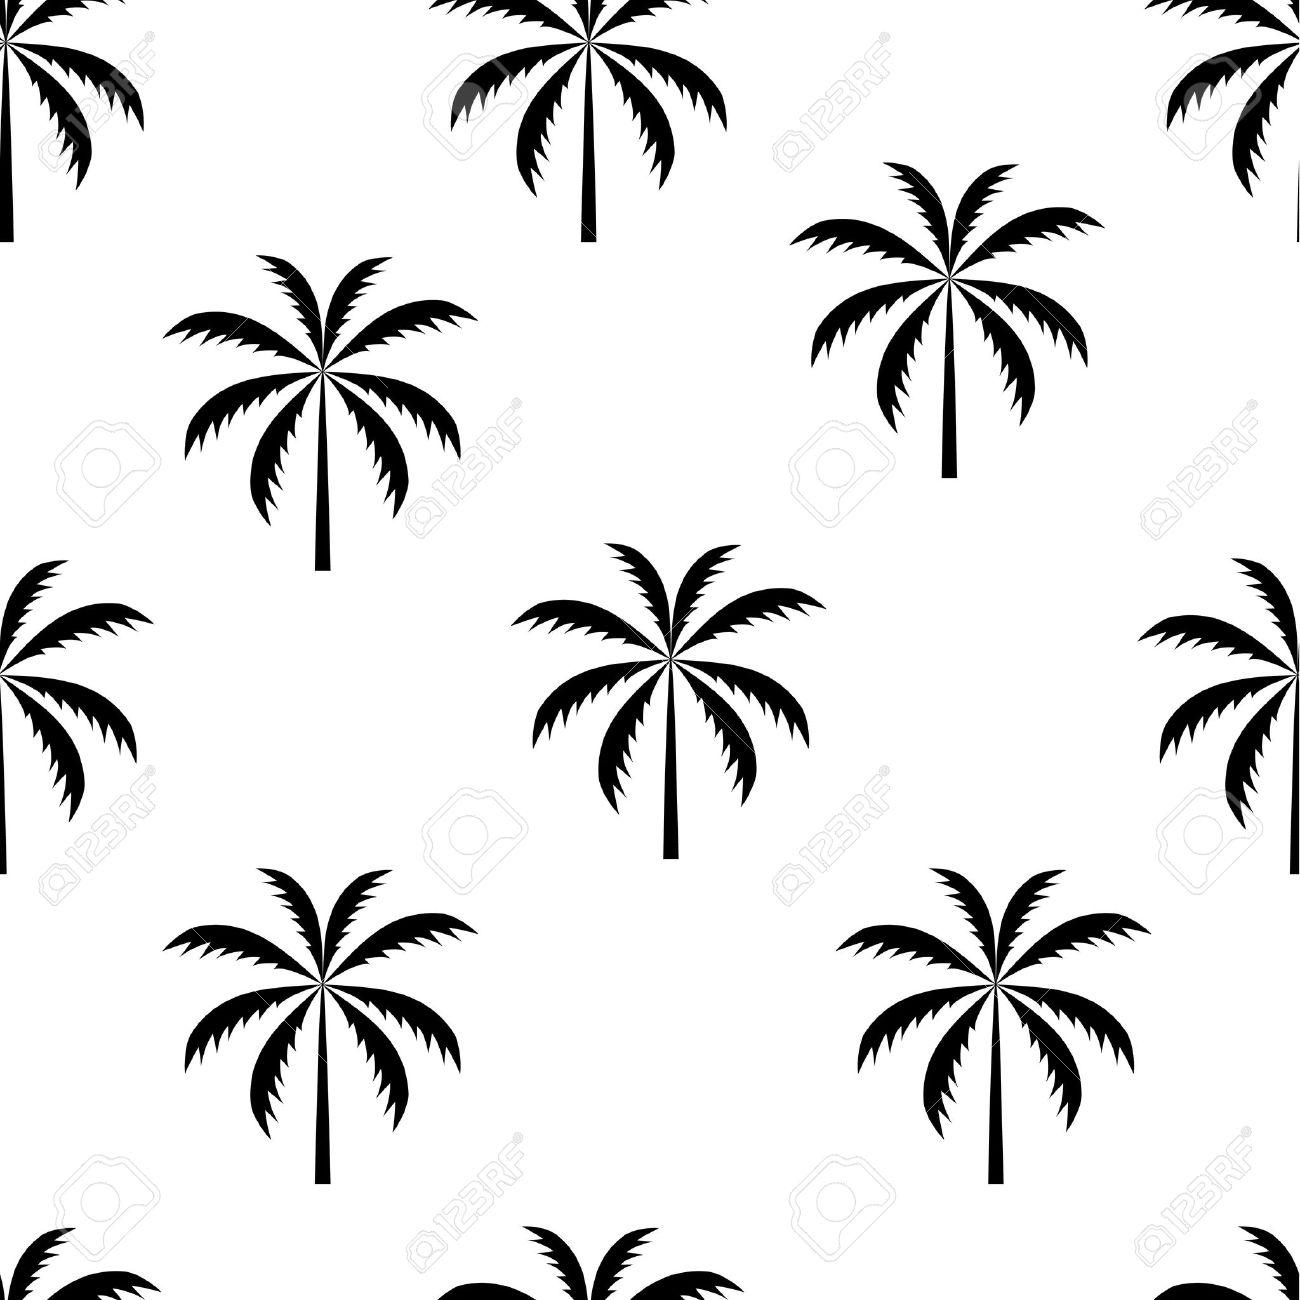 palm tree seamless pattern vector illustration royalty free cliparts rh 123rf com